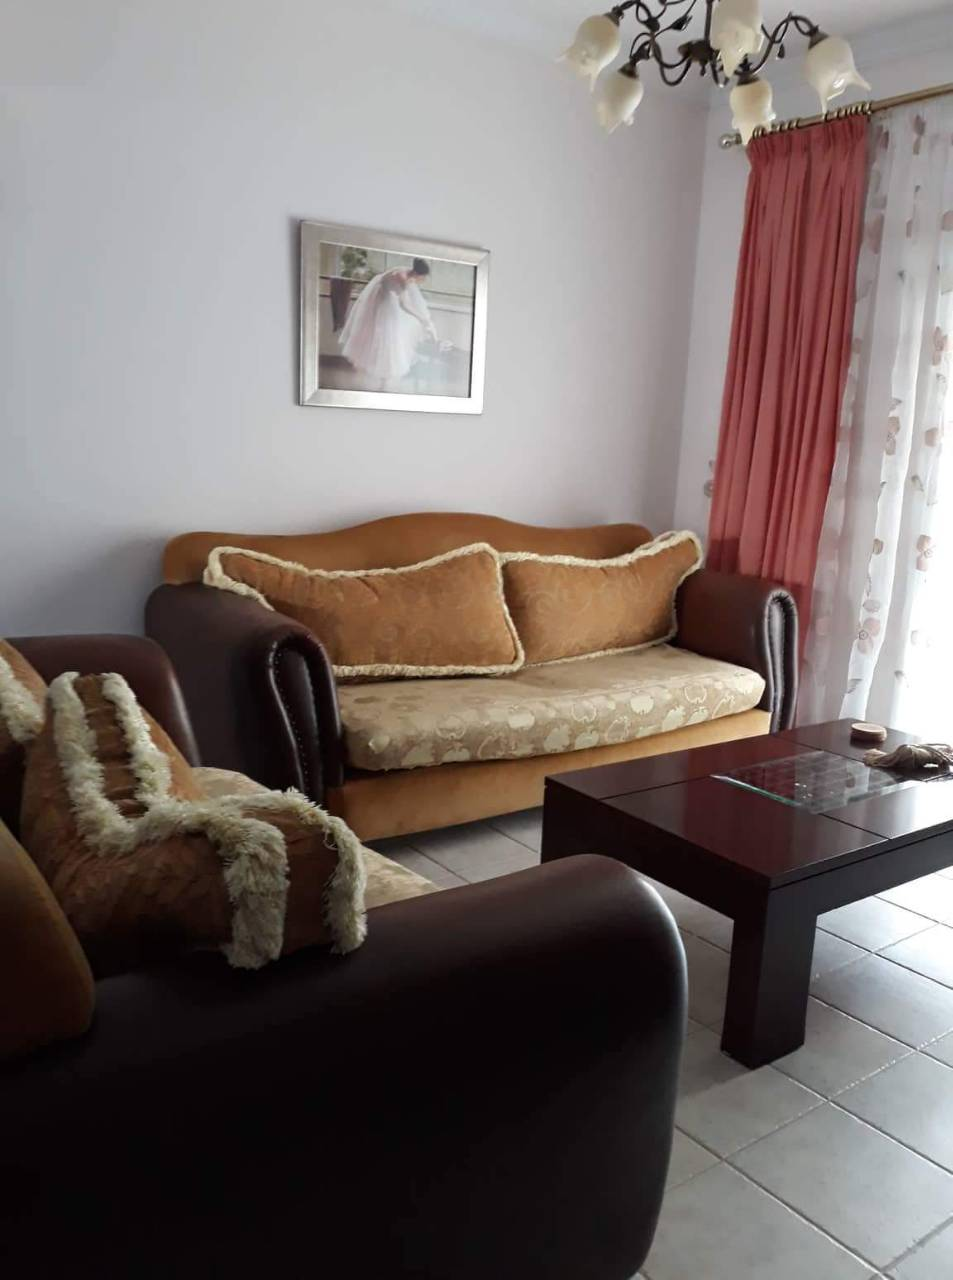 Сдаётся квартира посуточно на полу-ве Халкидики, Кассандра, Греция.